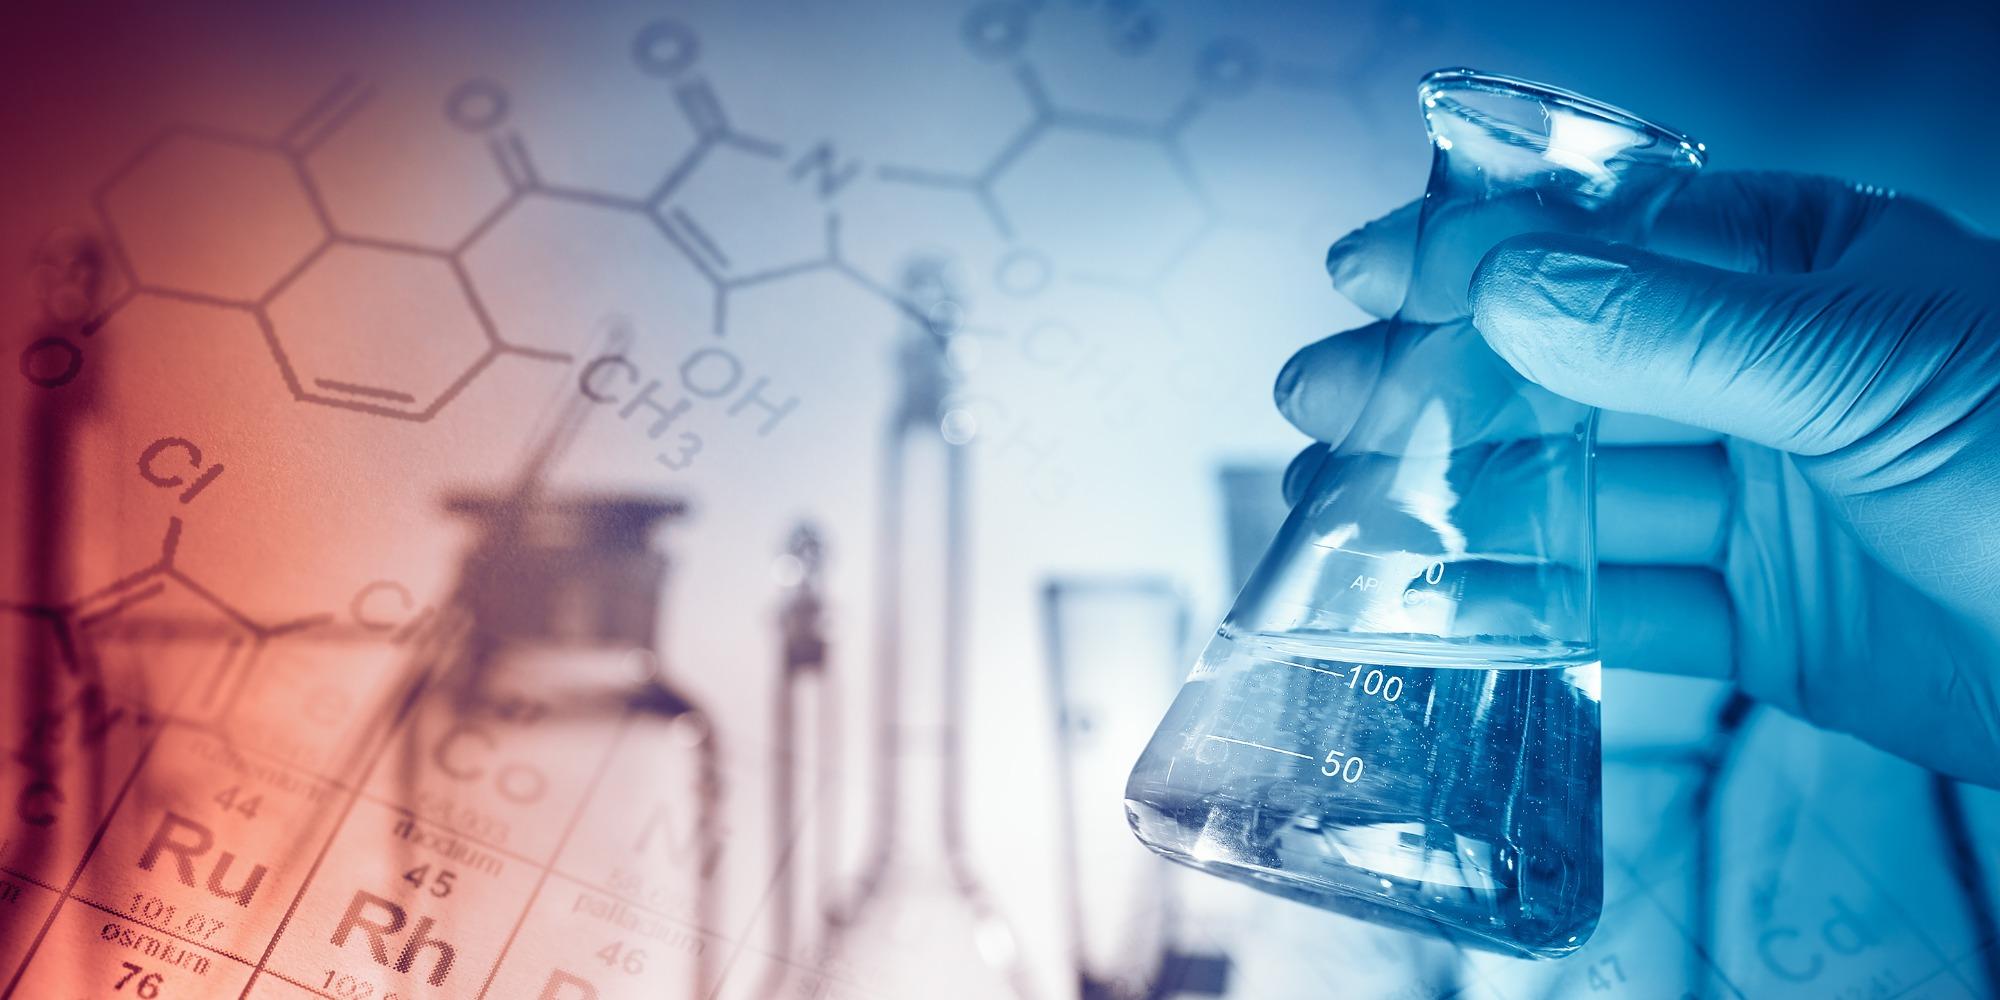 Beaker in a chemistry lab